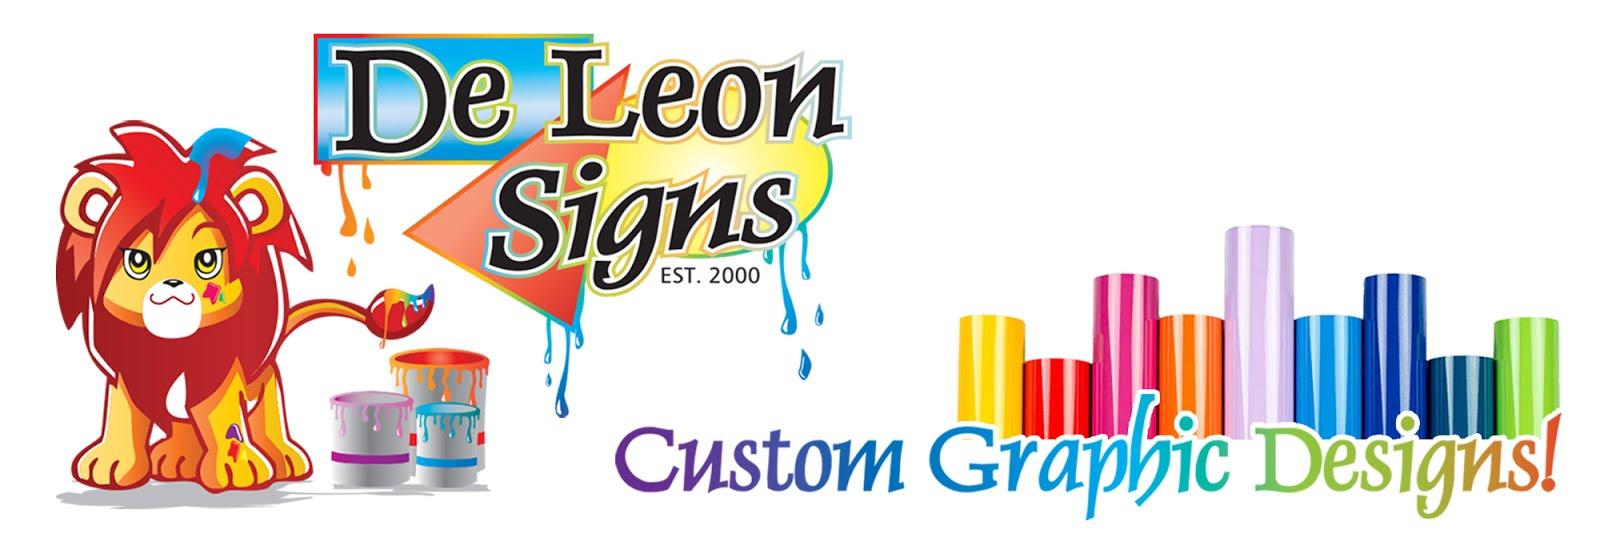 De Leon Signs